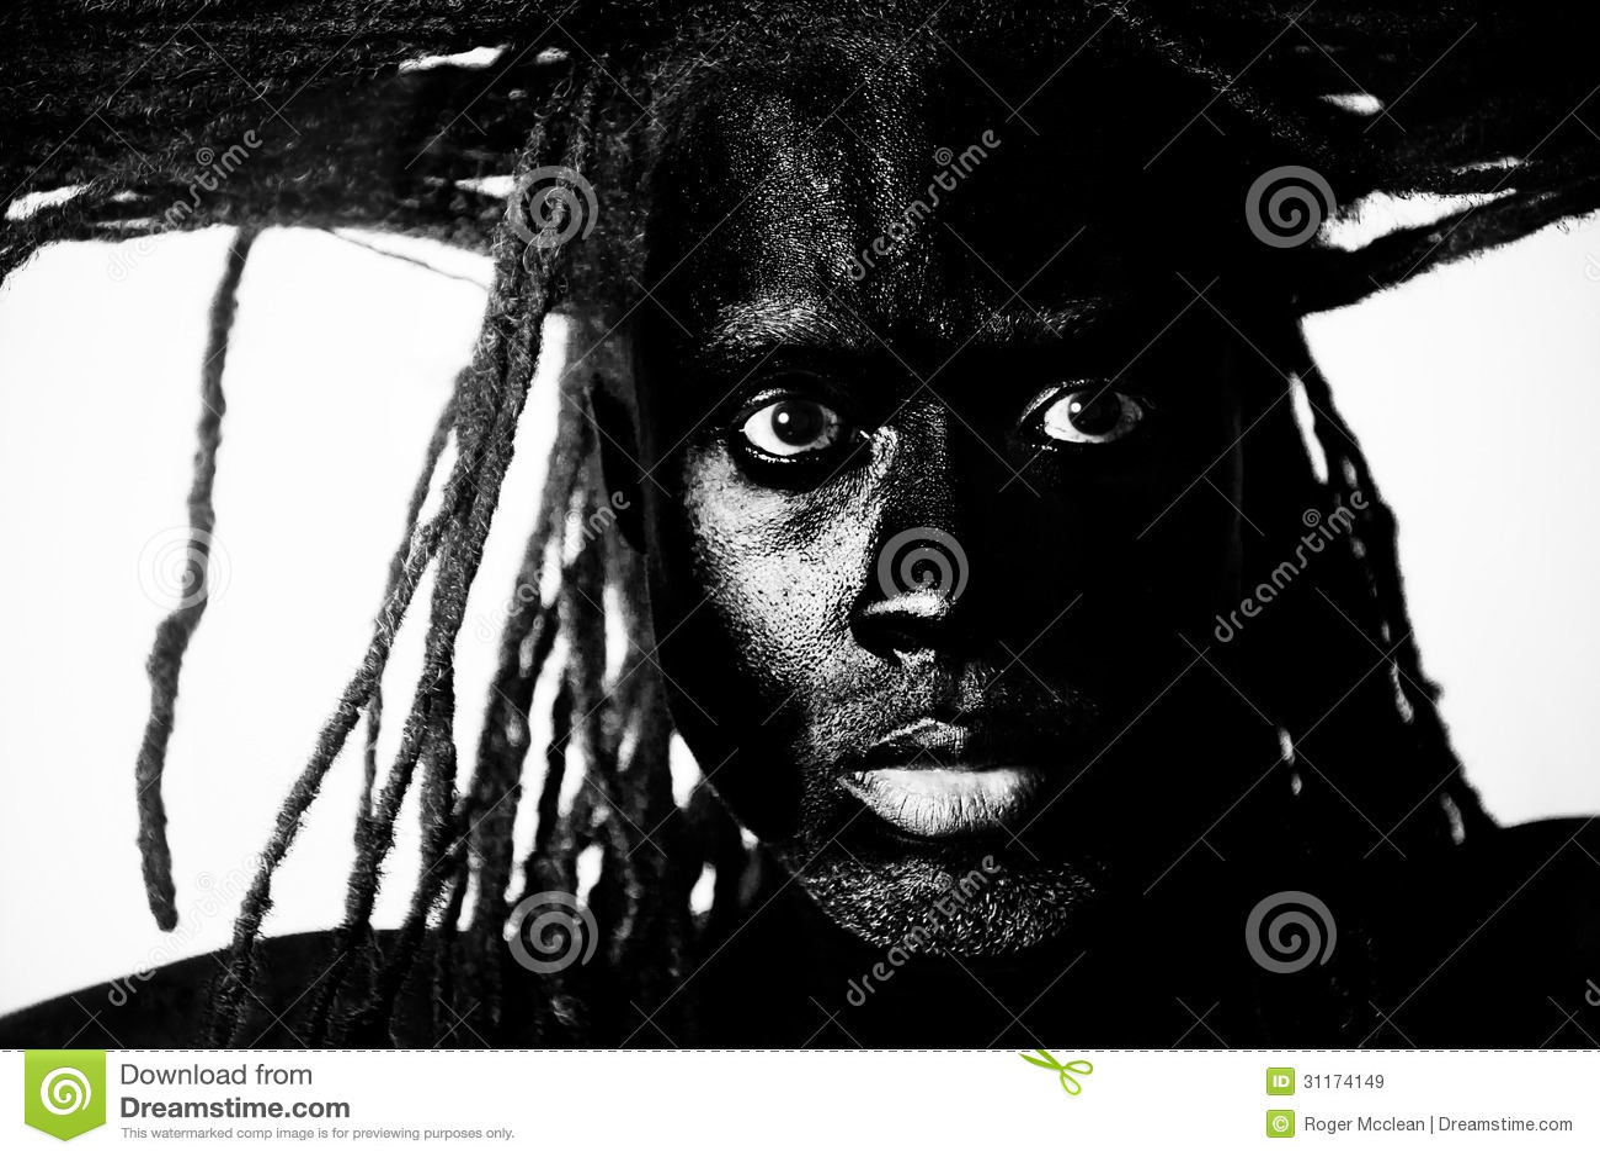 Penteado masculino preto